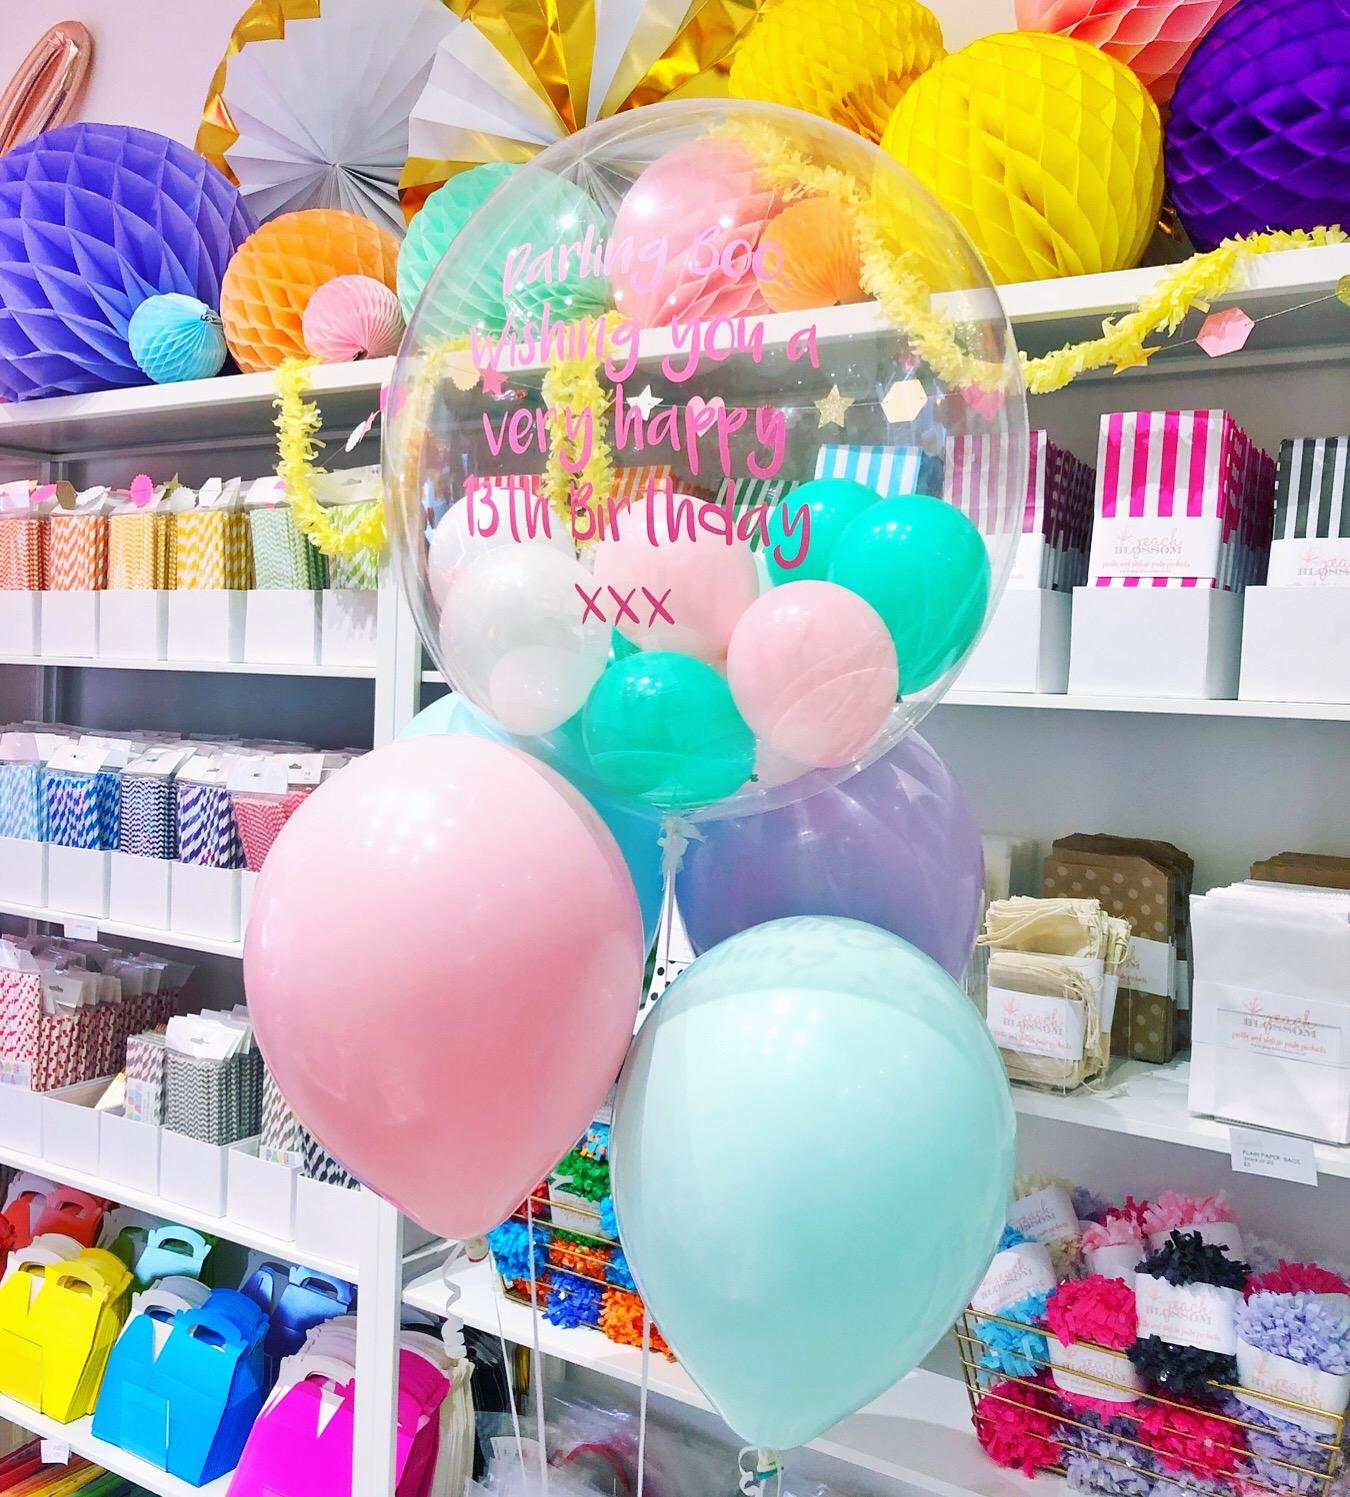 pastel-latex-and-bubble-birthday.jpg